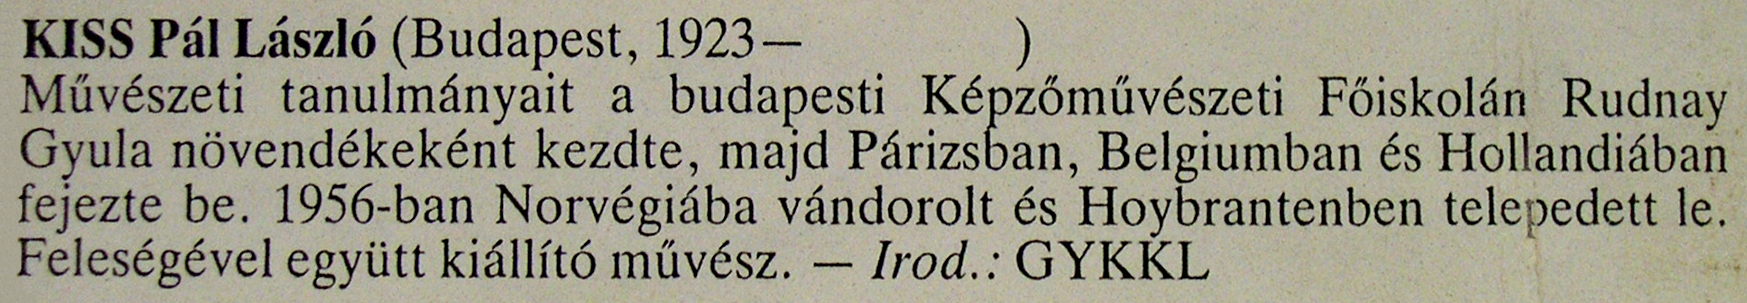 98-3c2.jpg (1747�303)